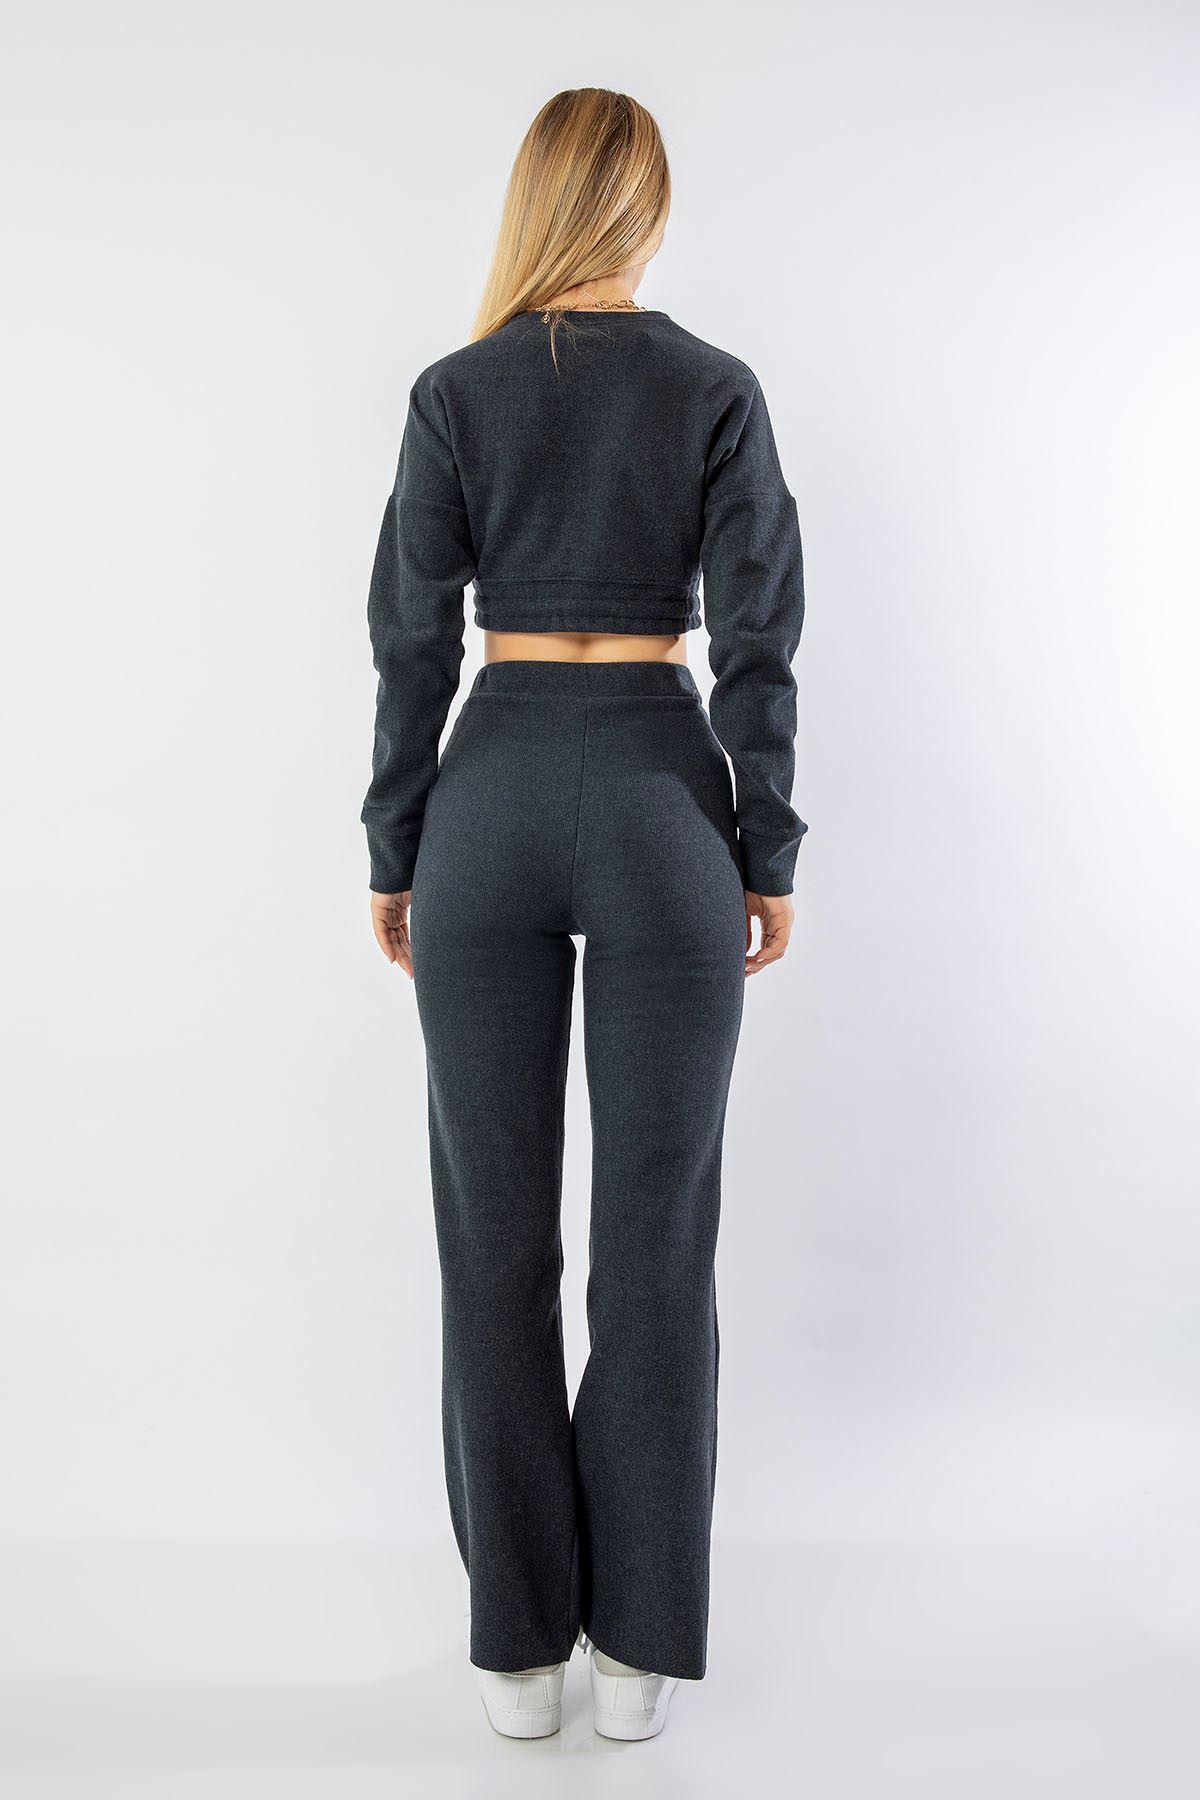 Bol Paça Pantolon Takım-Antrasit